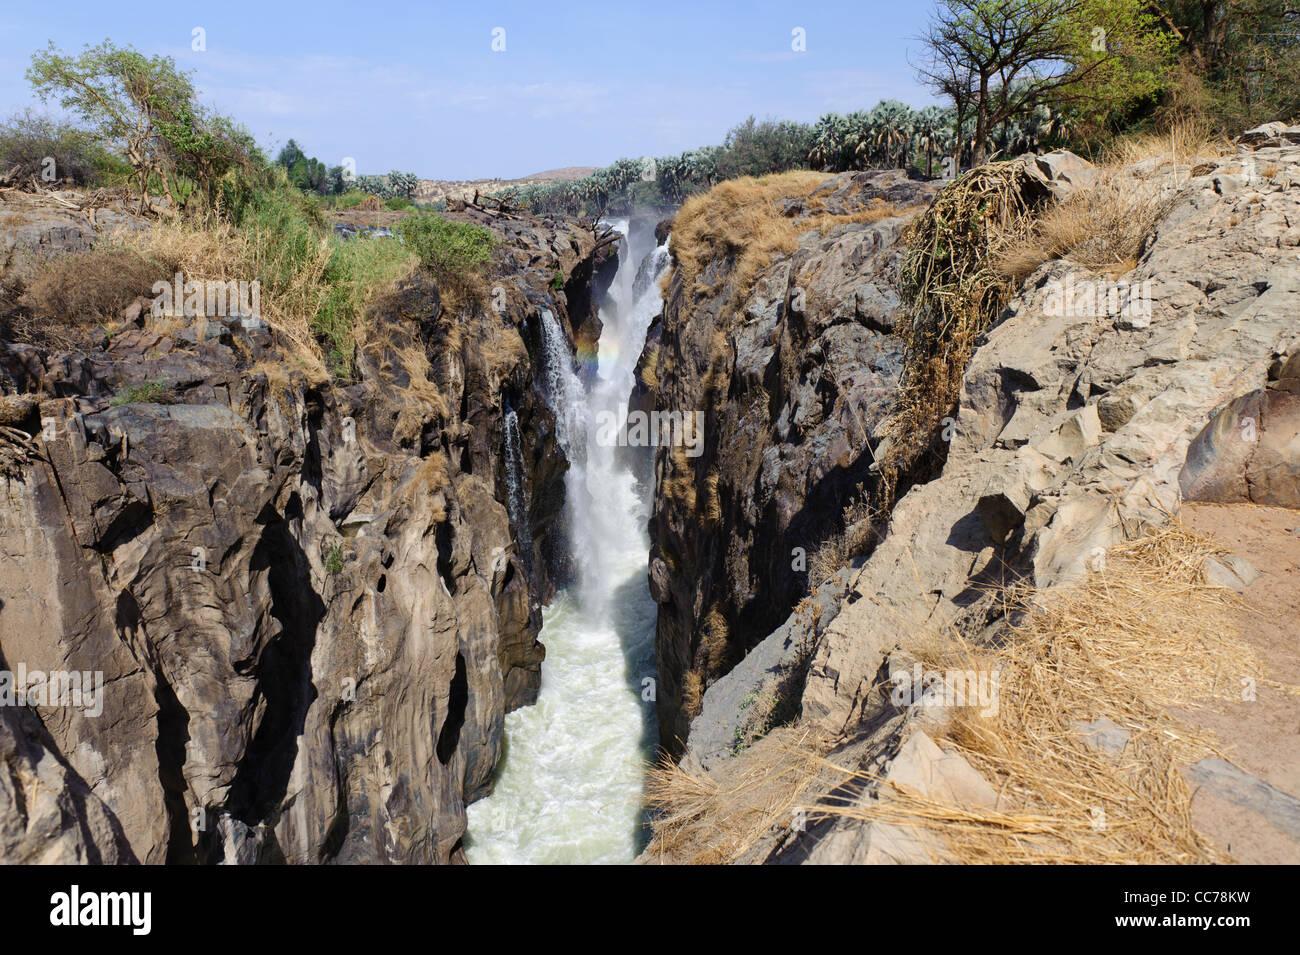 Epupa Falls en novembre. Région de Kunene Kaokoland, la Namibie. Banque D'Images